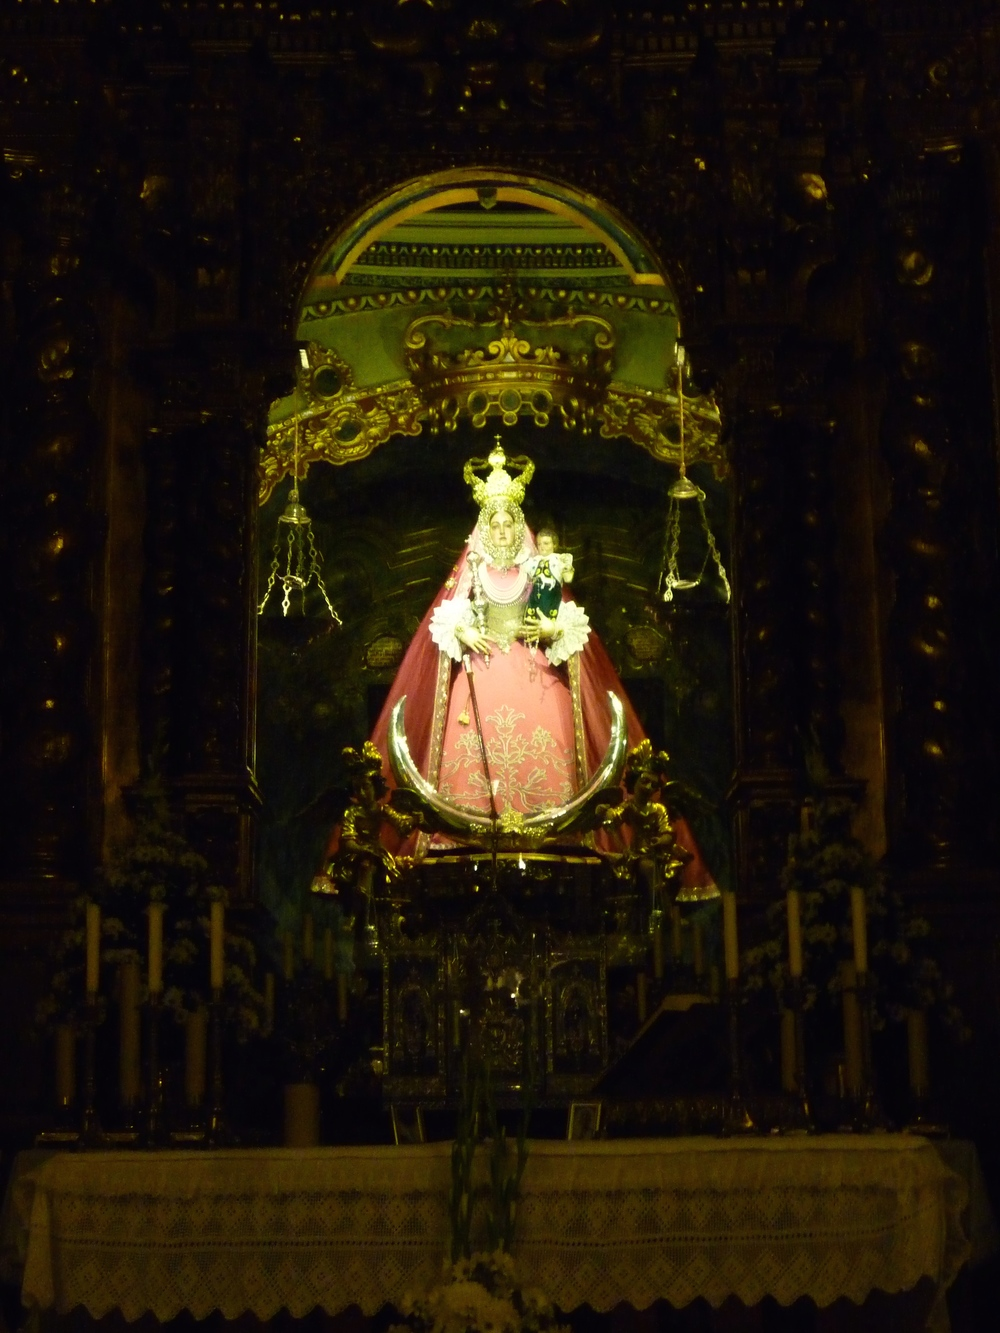 The Virgen de Araceli